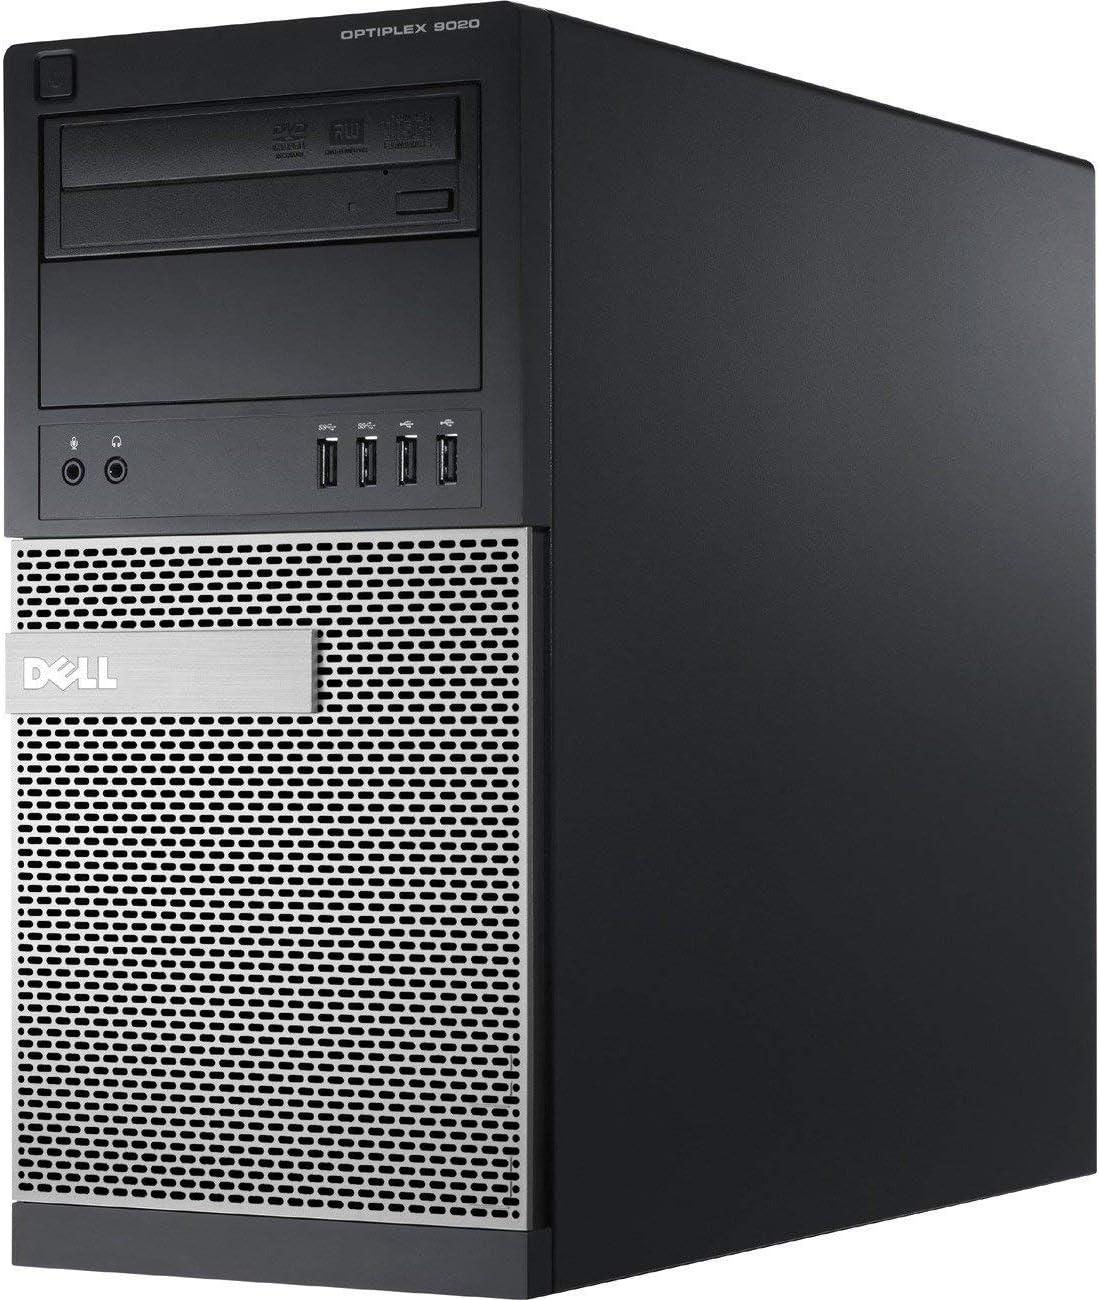 Dell OptiPlex 9020 High Performance Business Desktop Compute: Intel Quad-Core i7-4790 up to 4.0GHz/ 8GB RAM/ 320GB HDD/DVD-RW/WiFi/USB 3.0/ Windows 10 Professional OS(Renewed)